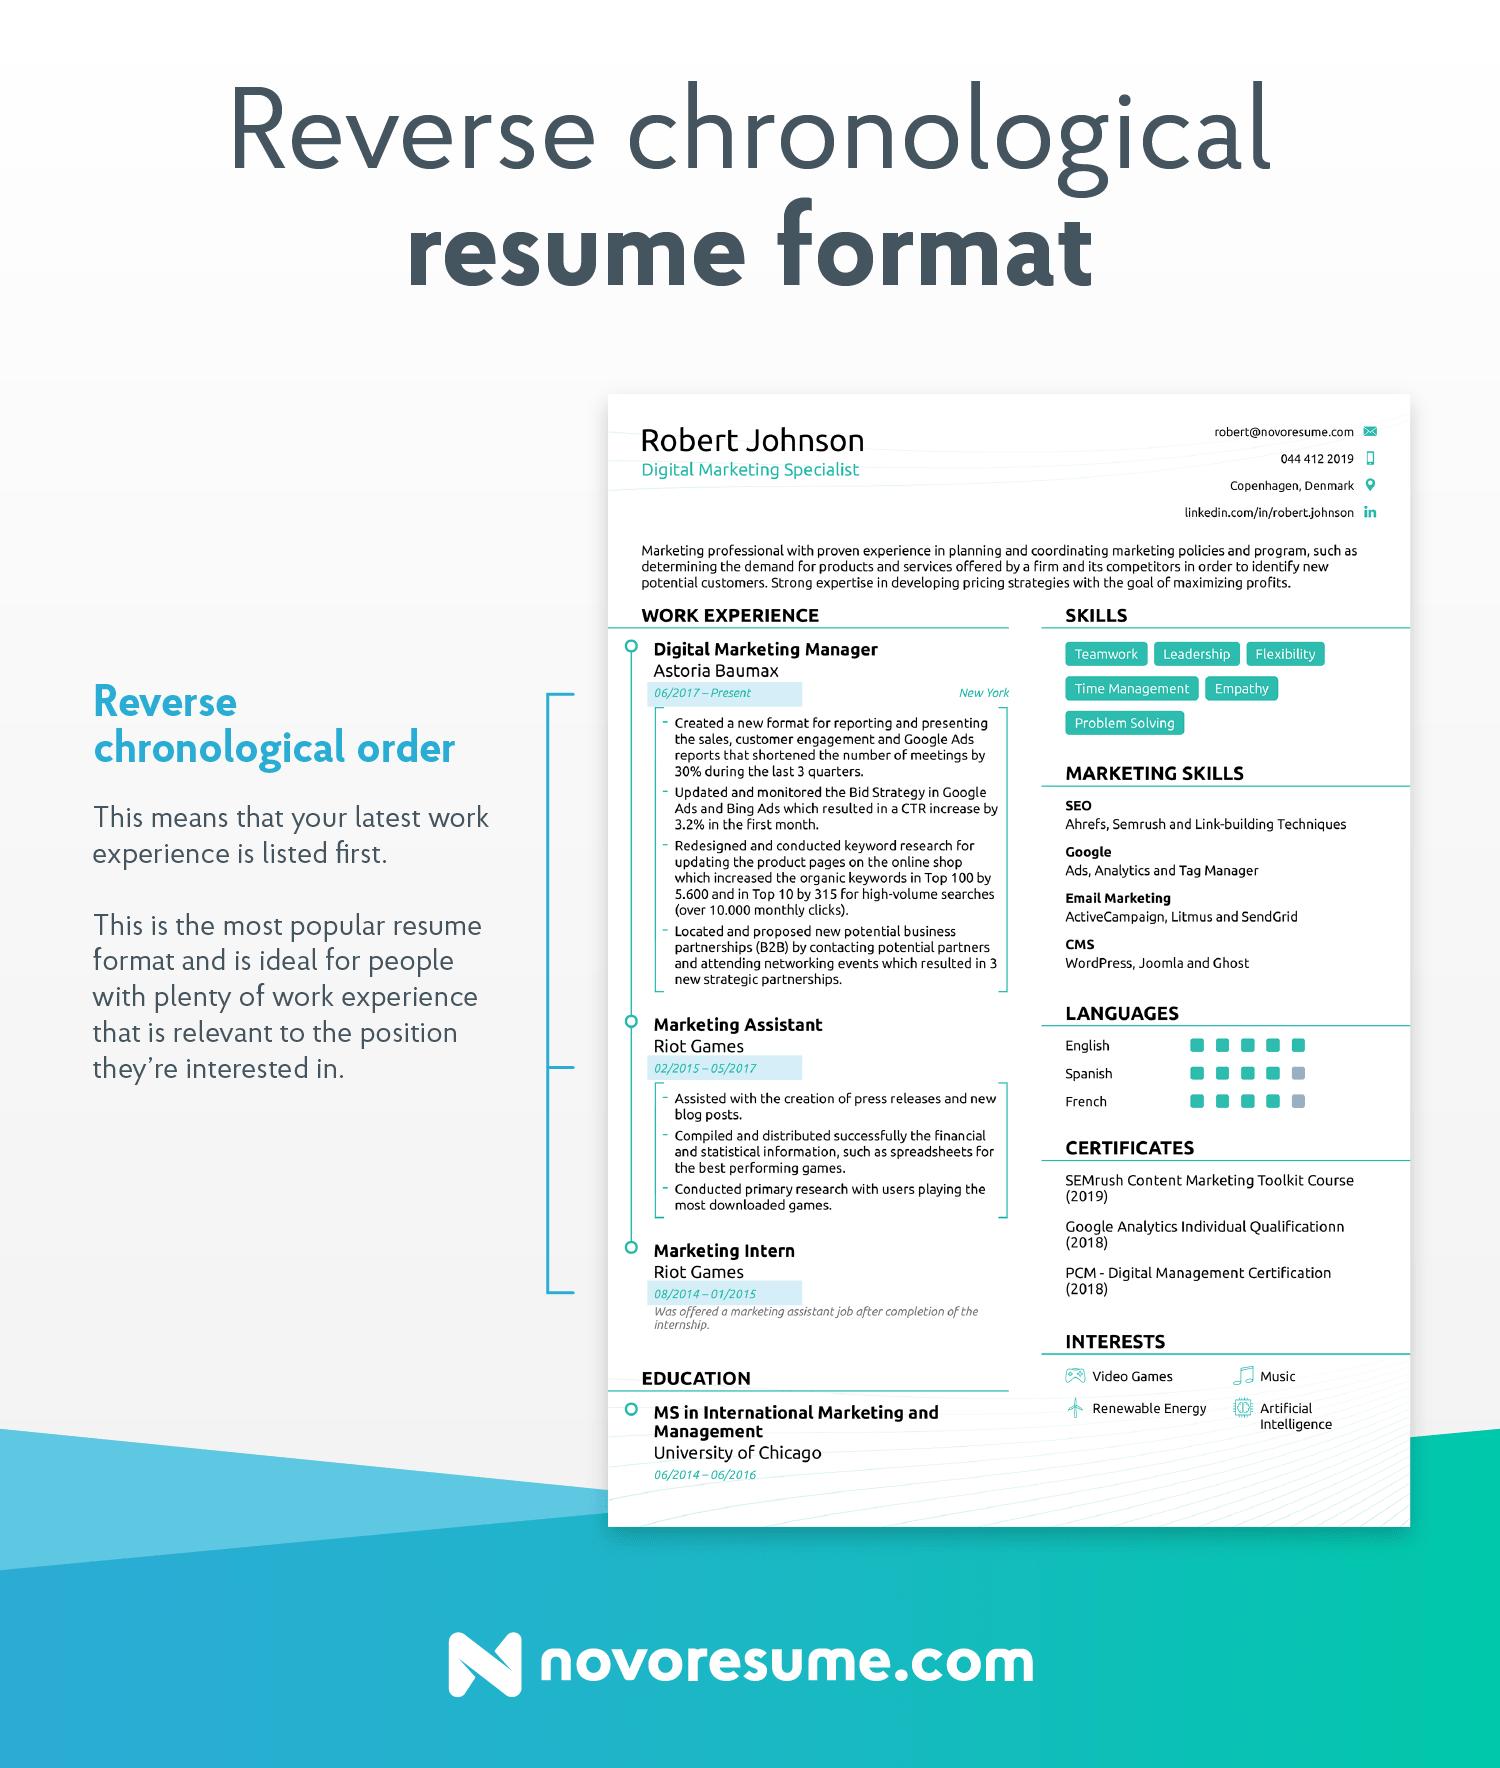 medical assistant reverse chronological resume